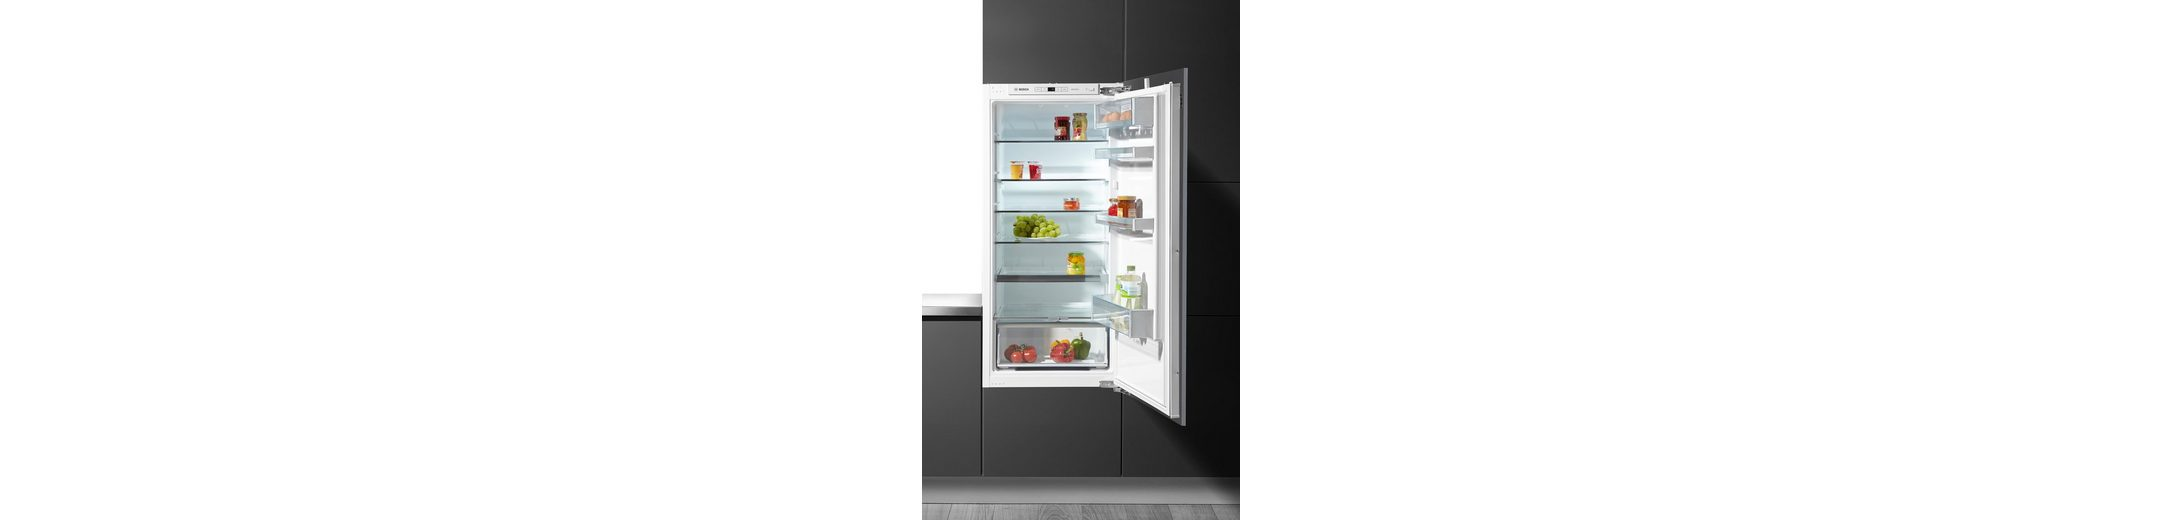 Bosch Integrierbarer Einbau-Kühlautomat KIR41AD40, A+++, 122,5 cm hoch